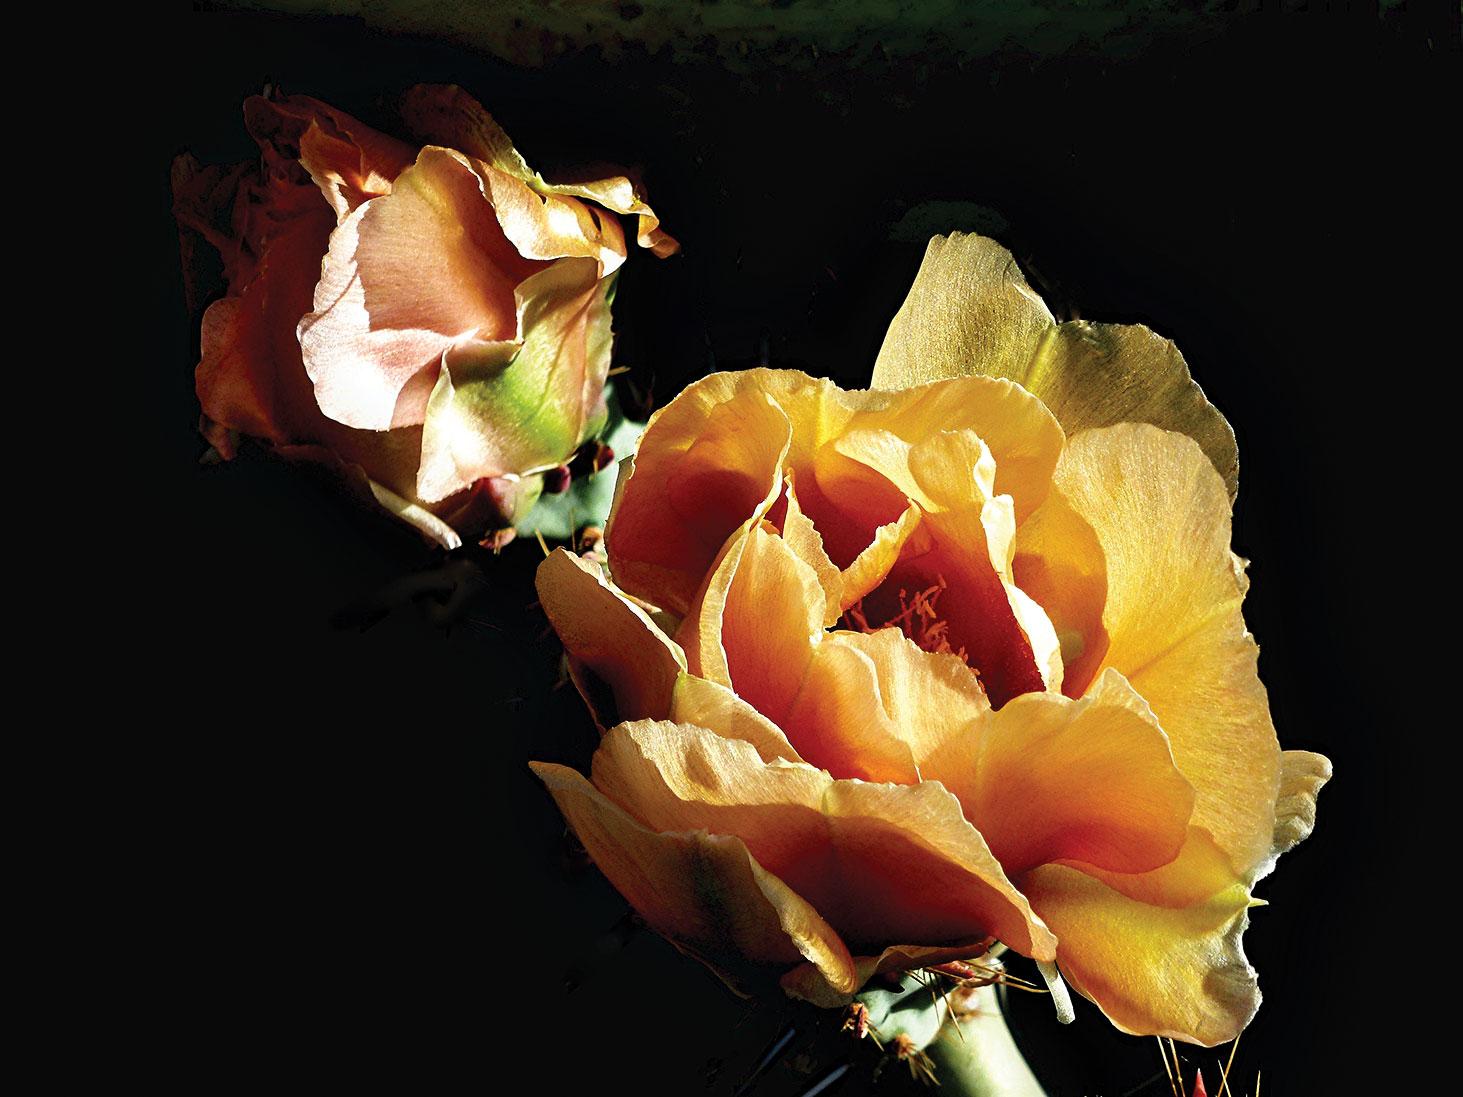 Third Place: Christel Phillips - Cactus Flower